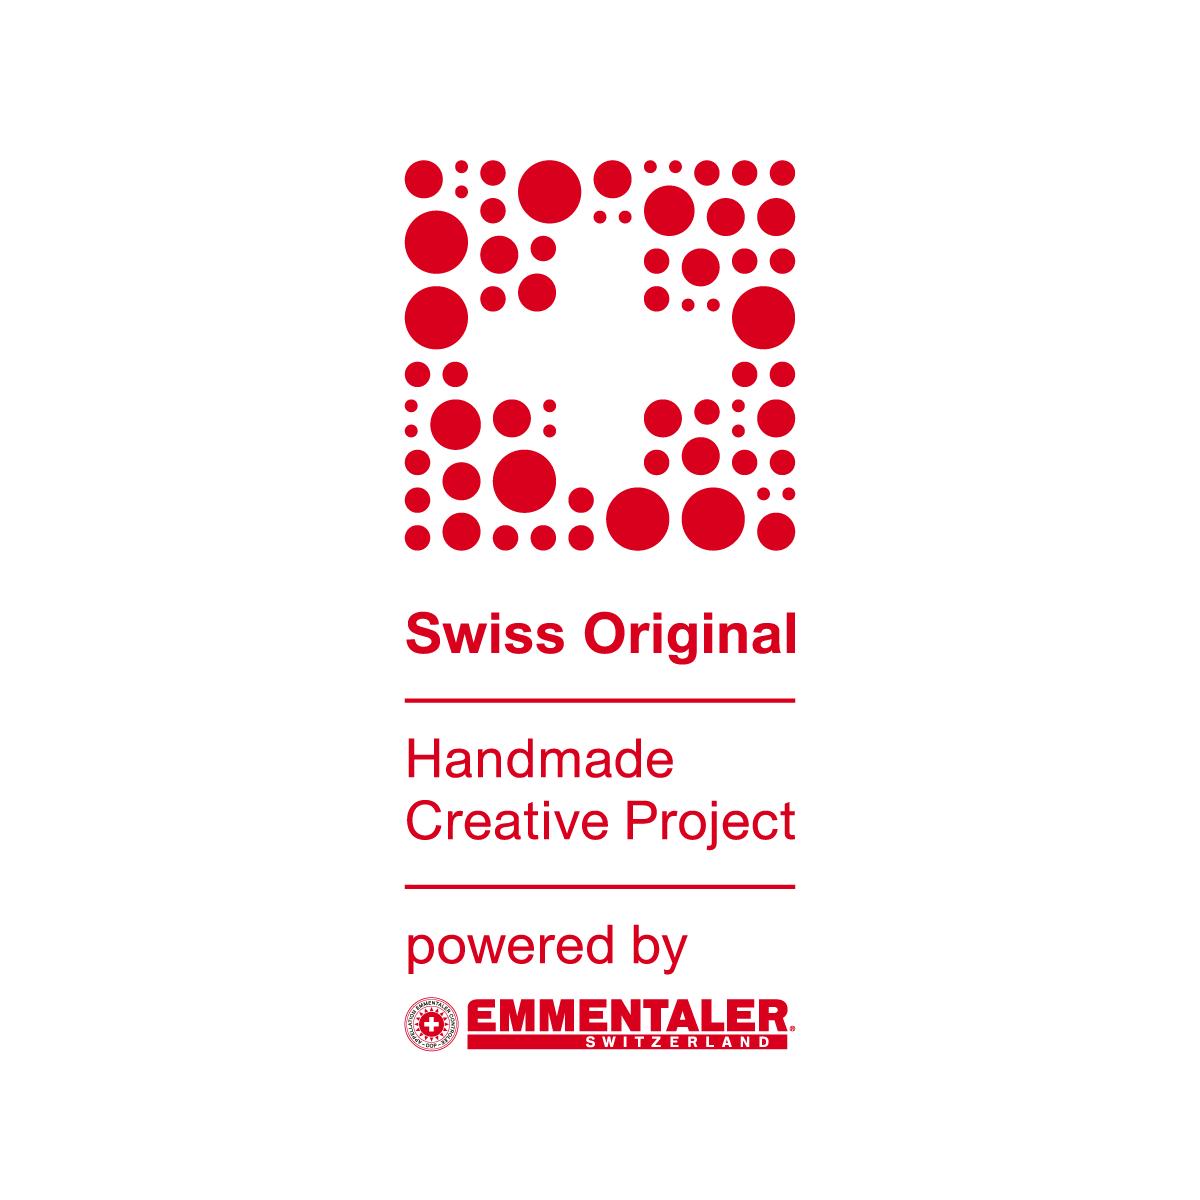 Swiss Original Handmade Creative Project (Award Eur 36,000)